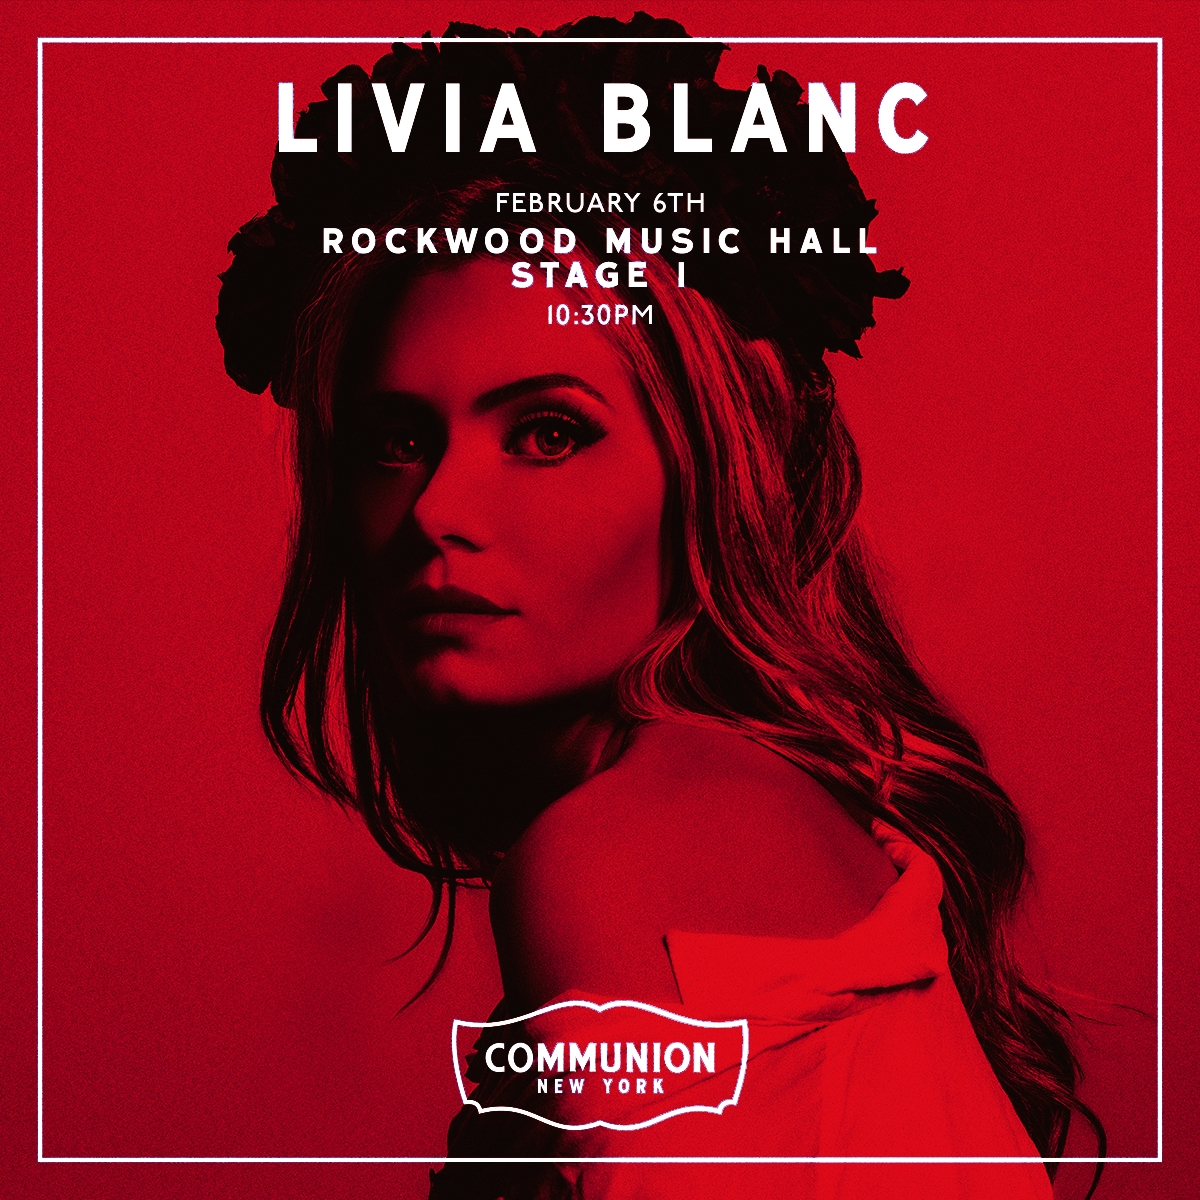 NYC_Bands_Feb2018_Insta_1200x1200_LiviaBlanc_red.jpg